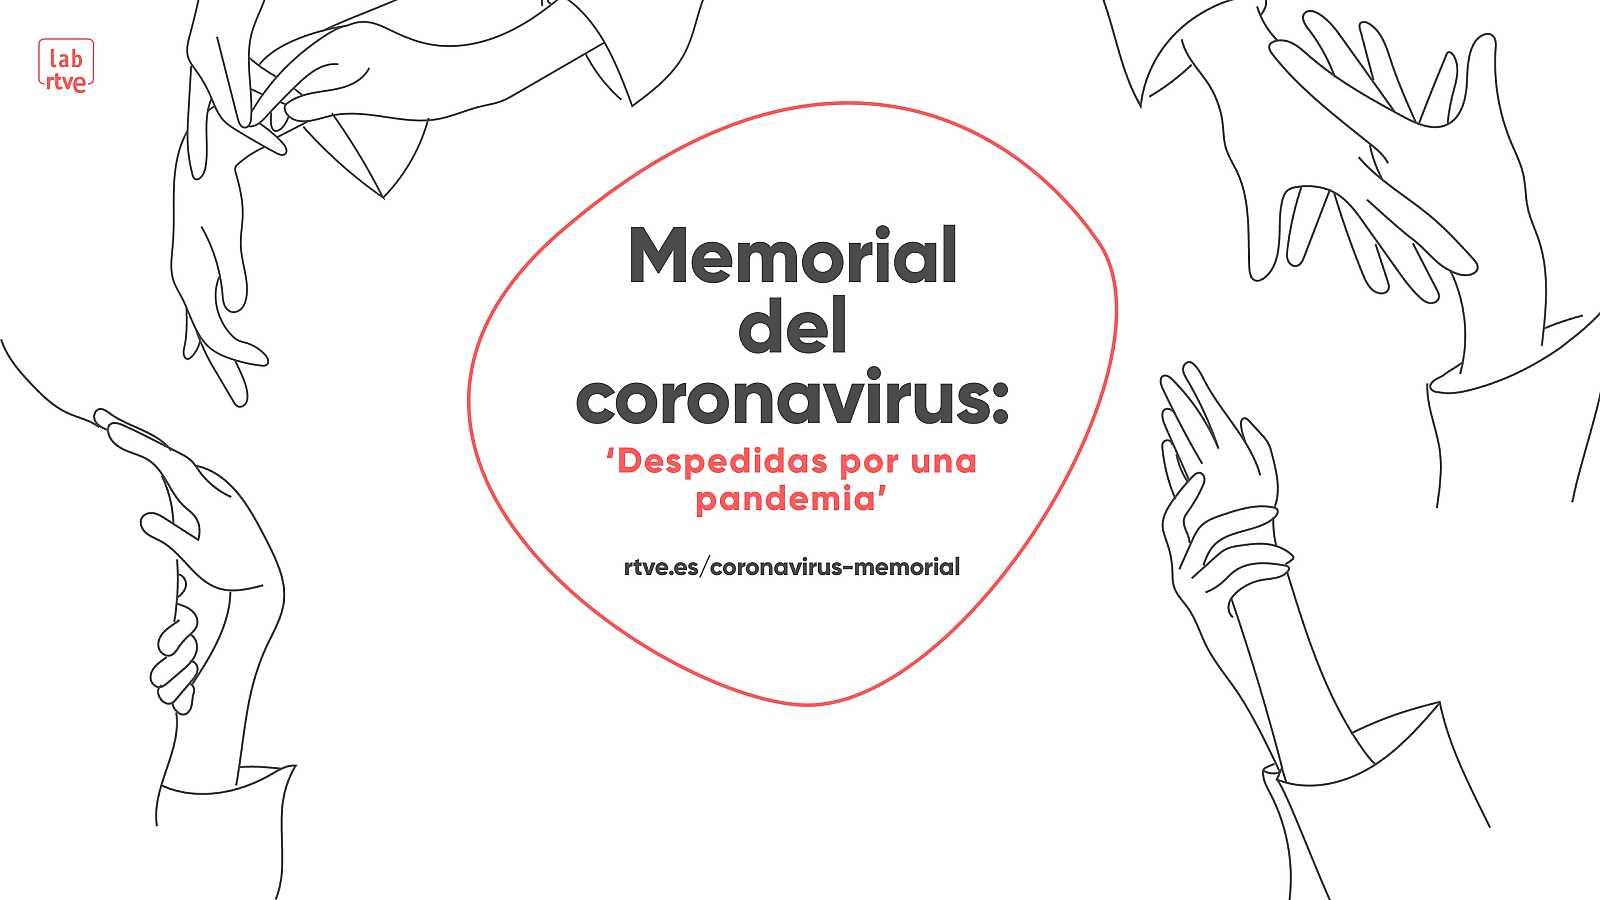 Memorial del Coronavirus